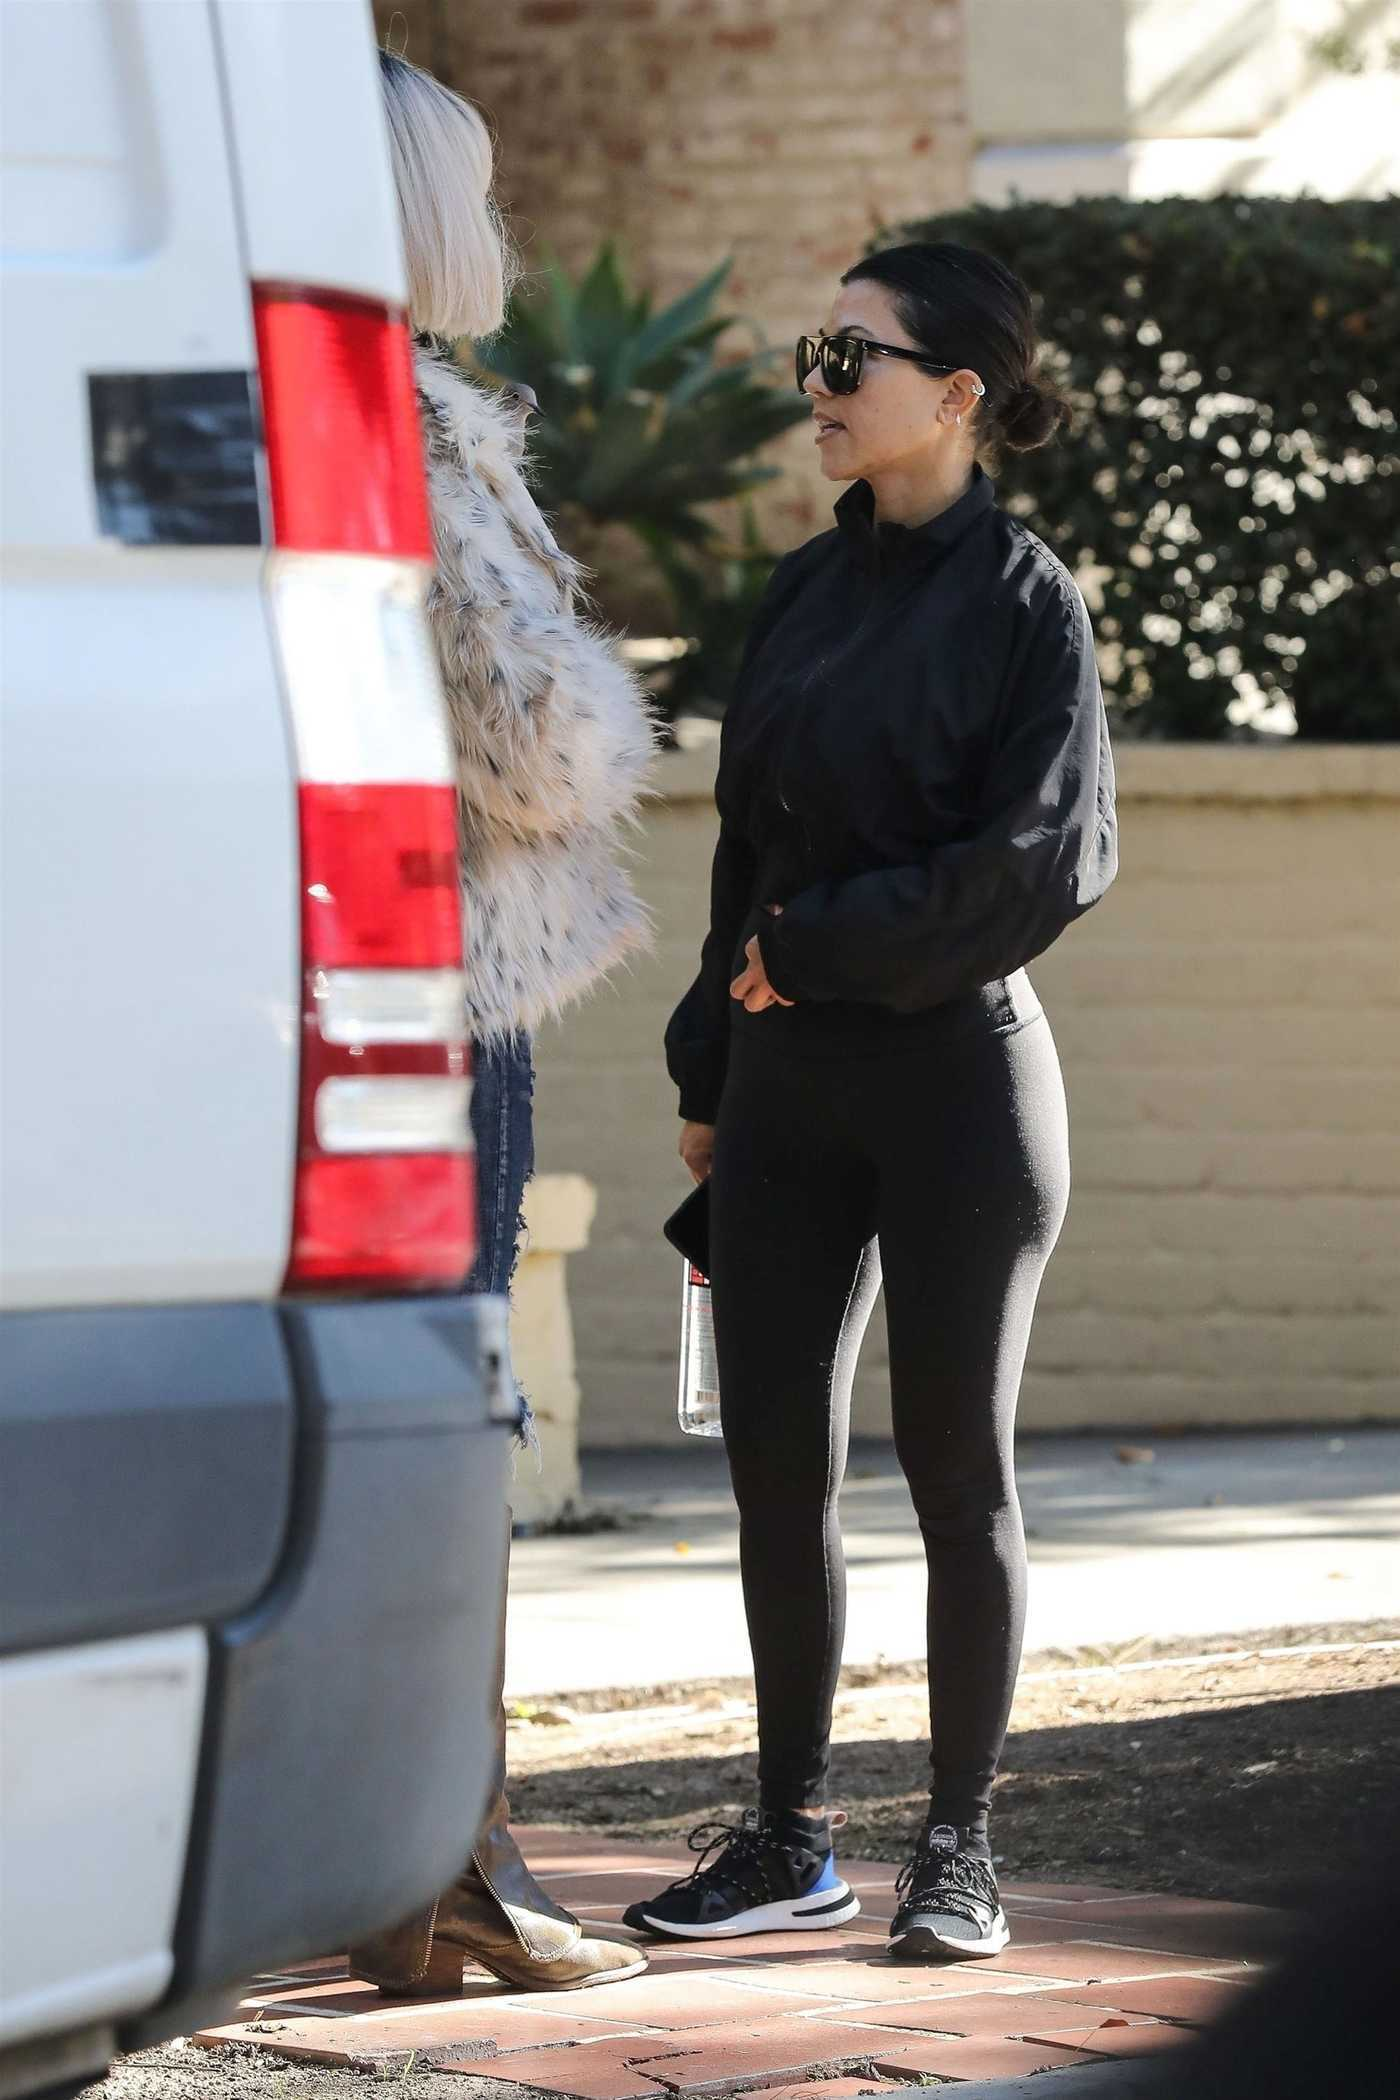 Kourtney Kardashian in a Black Leggings Arrives at a Friend's House in West Hollywood 12/27/2018